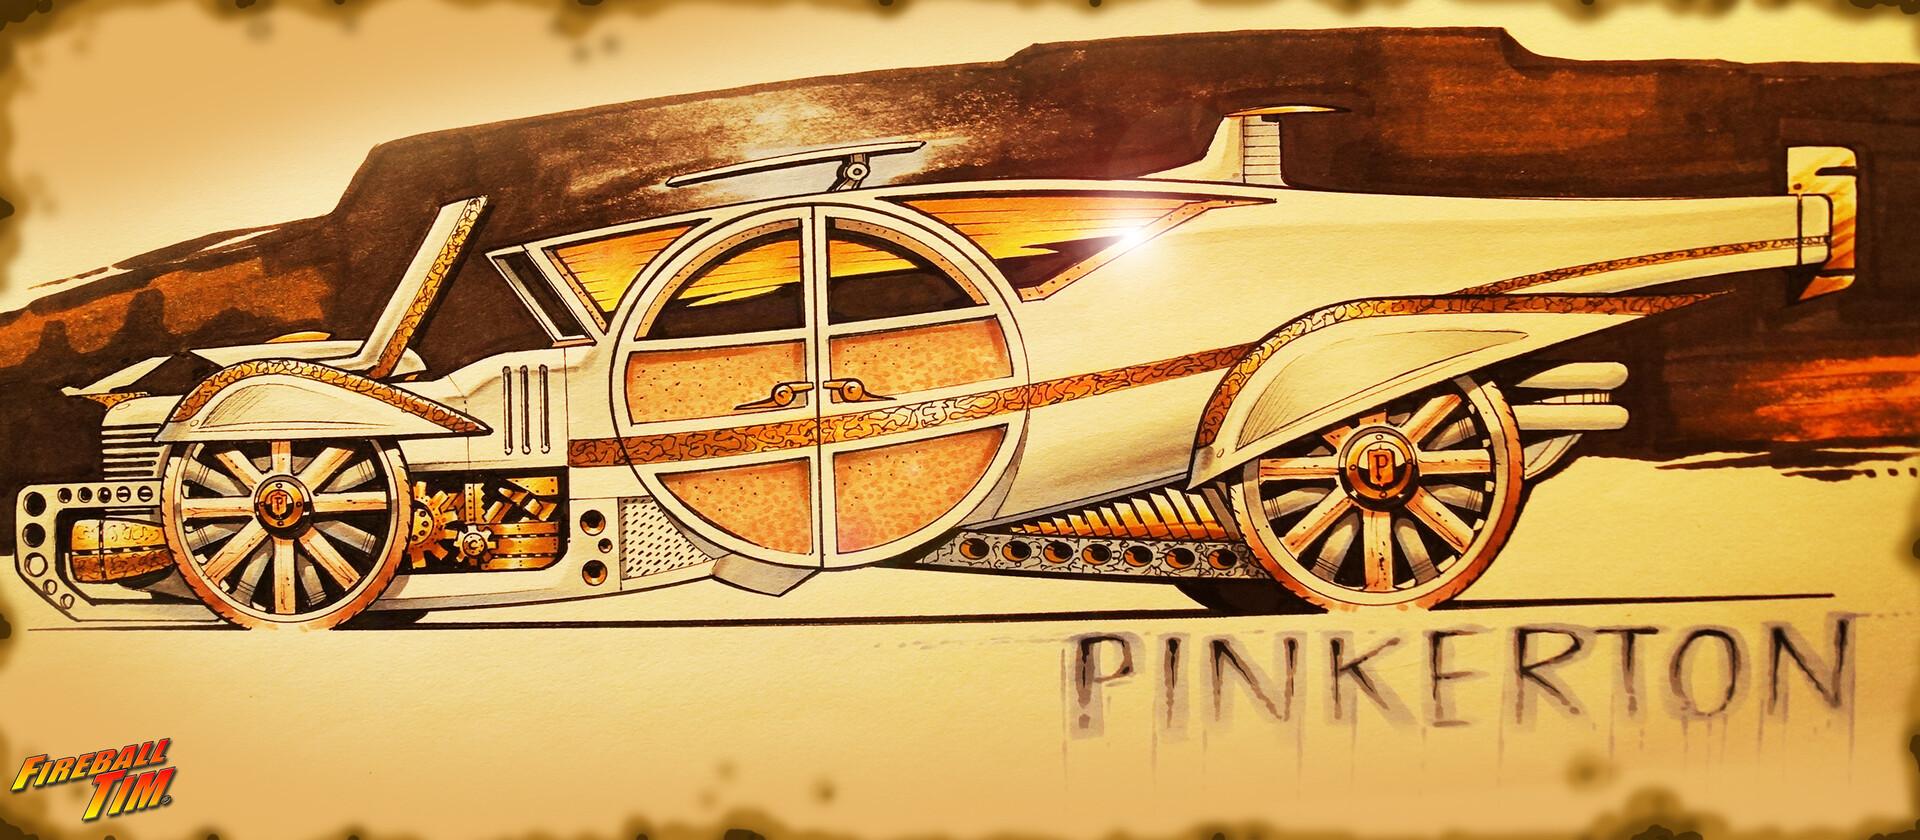 PINKERTON VINTAGE - PRIVATE CLIENT http://www.fireballtim.com